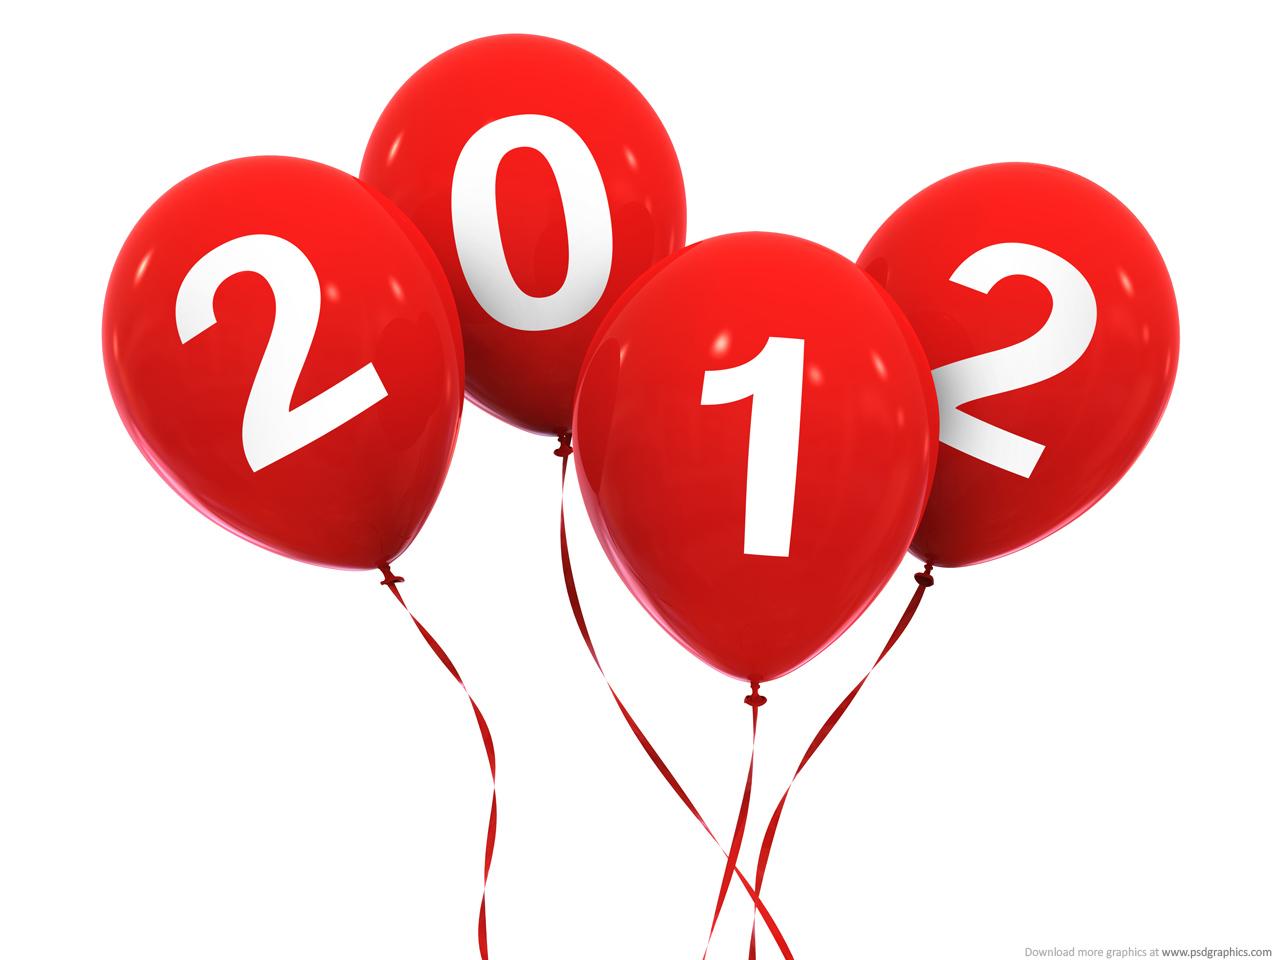 https://1.bp.blogspot.com/-uJZdwXNKIH8/TujR_ojixwI/AAAAAAAAALM/xEOPTC7F48c/s1600/new-year-2012-celebration.jpg